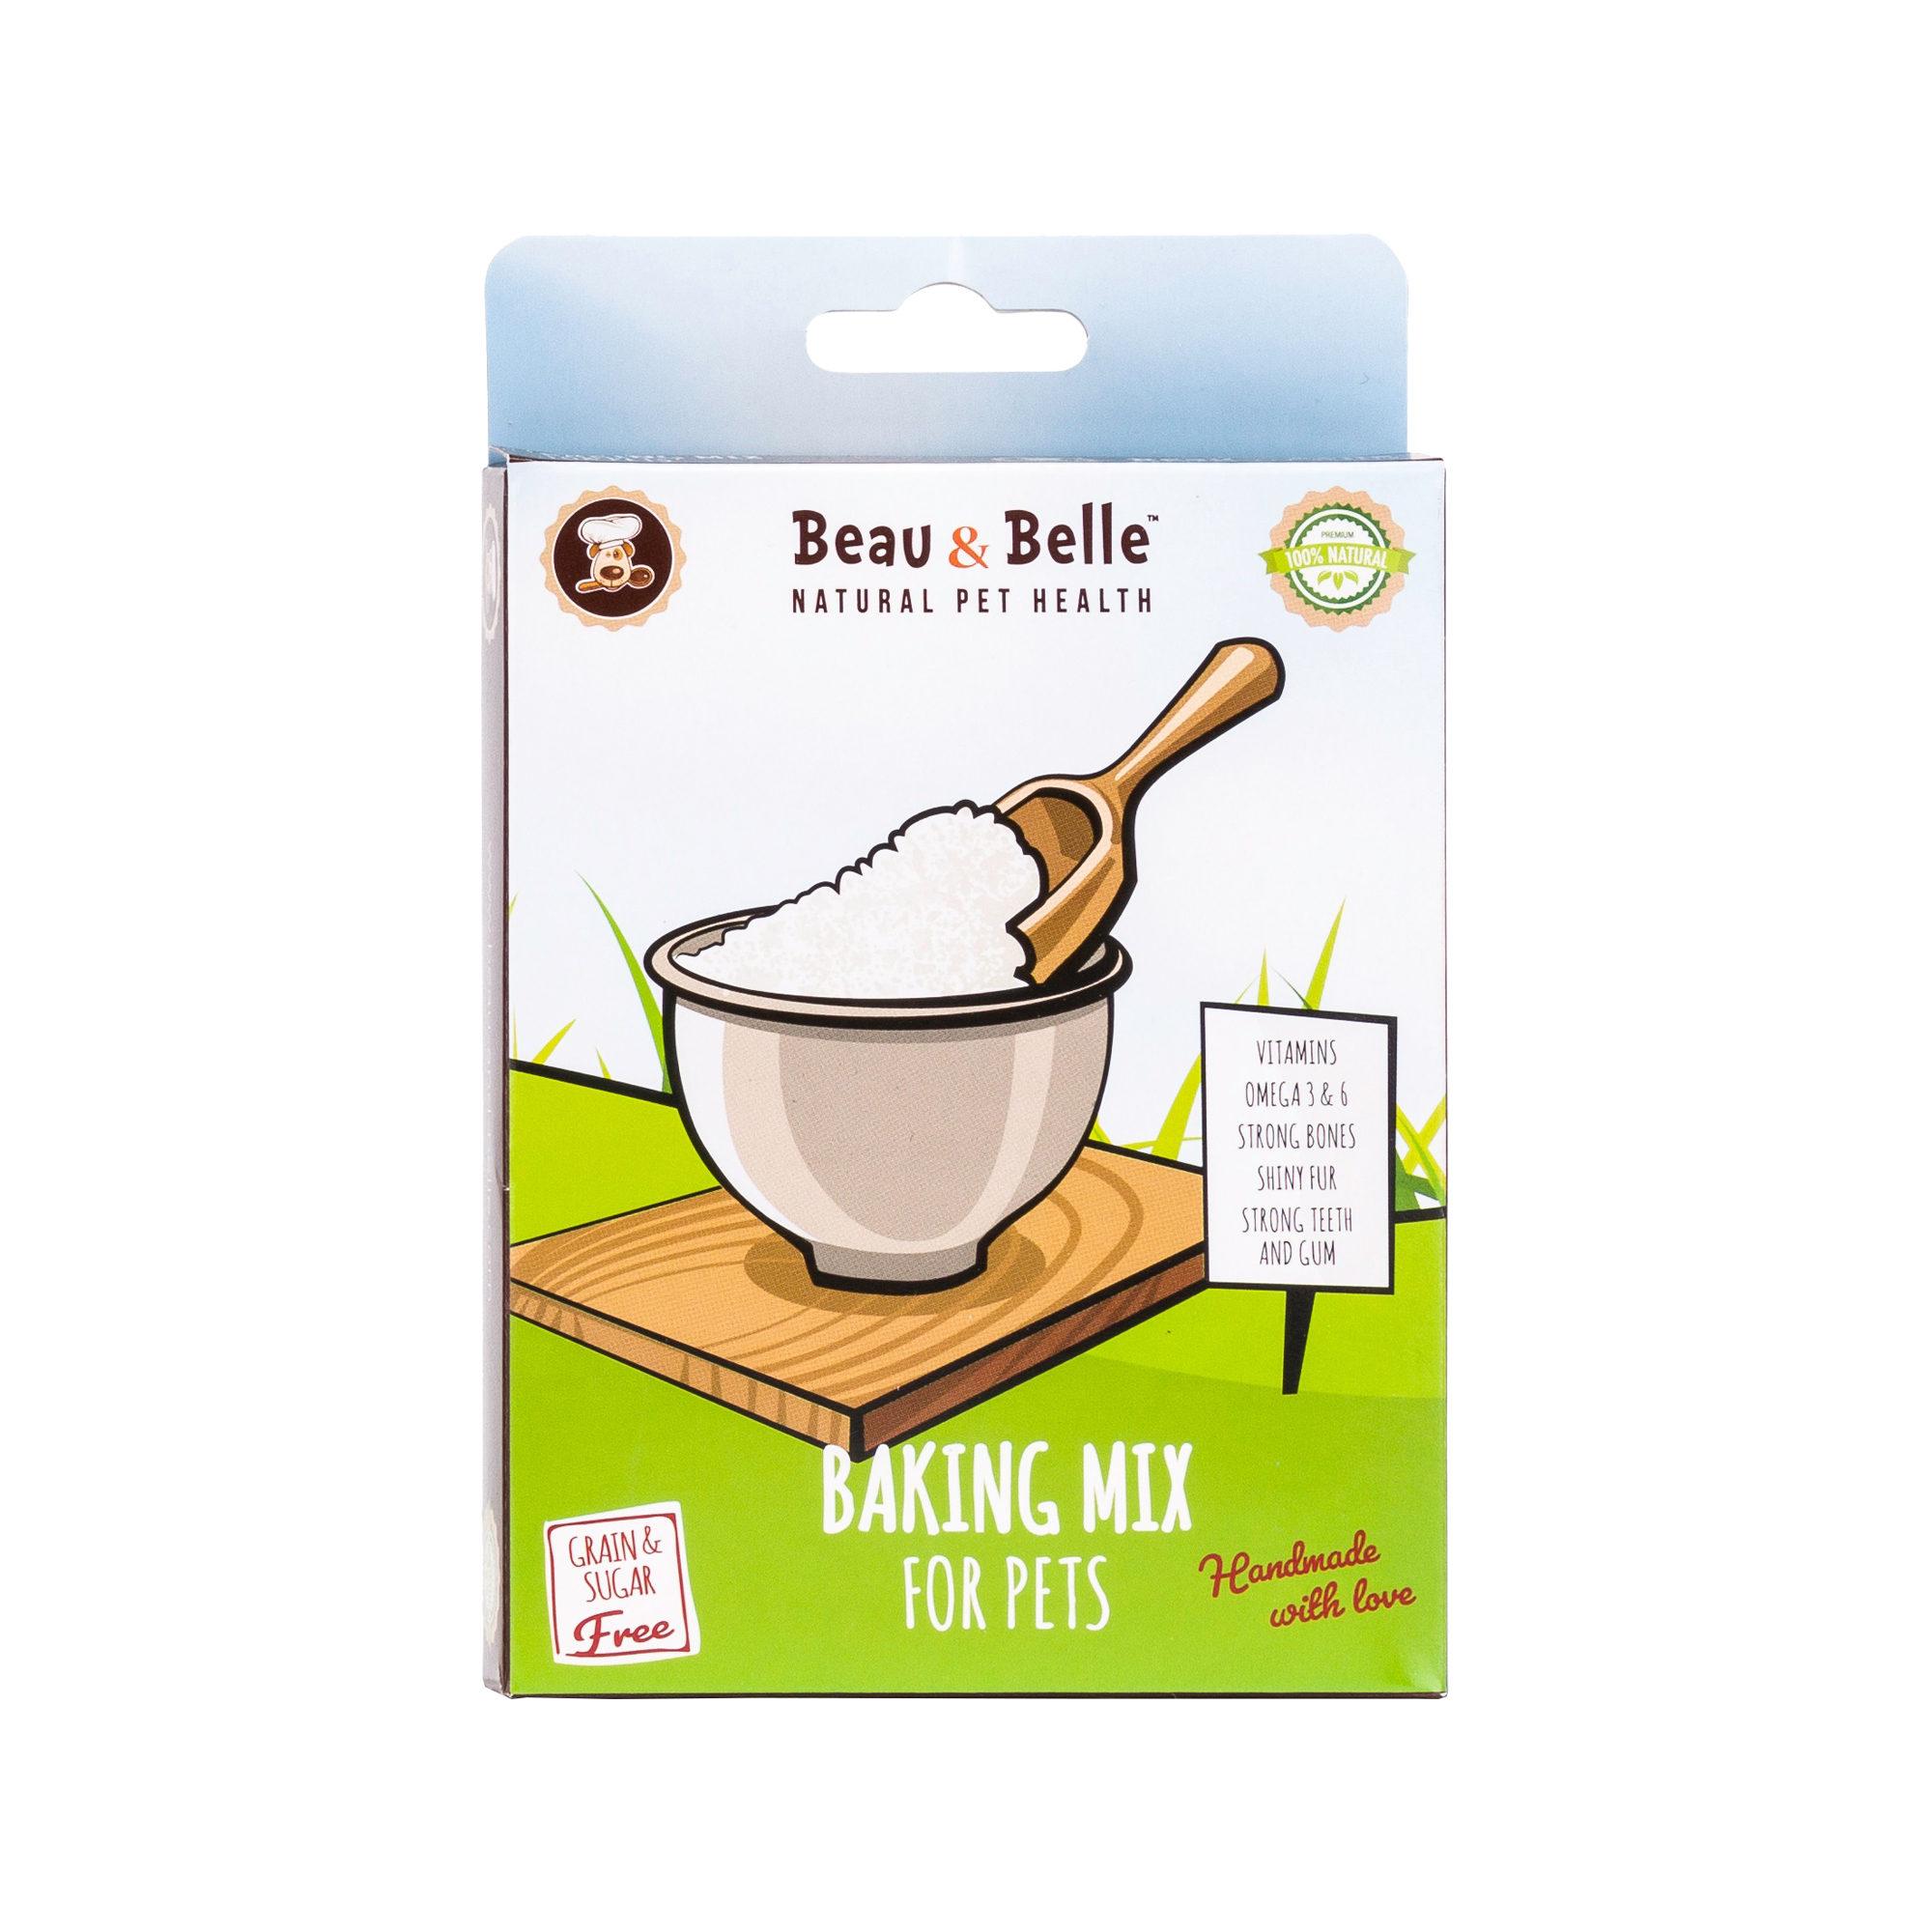 Beau & Belle Baking Mix